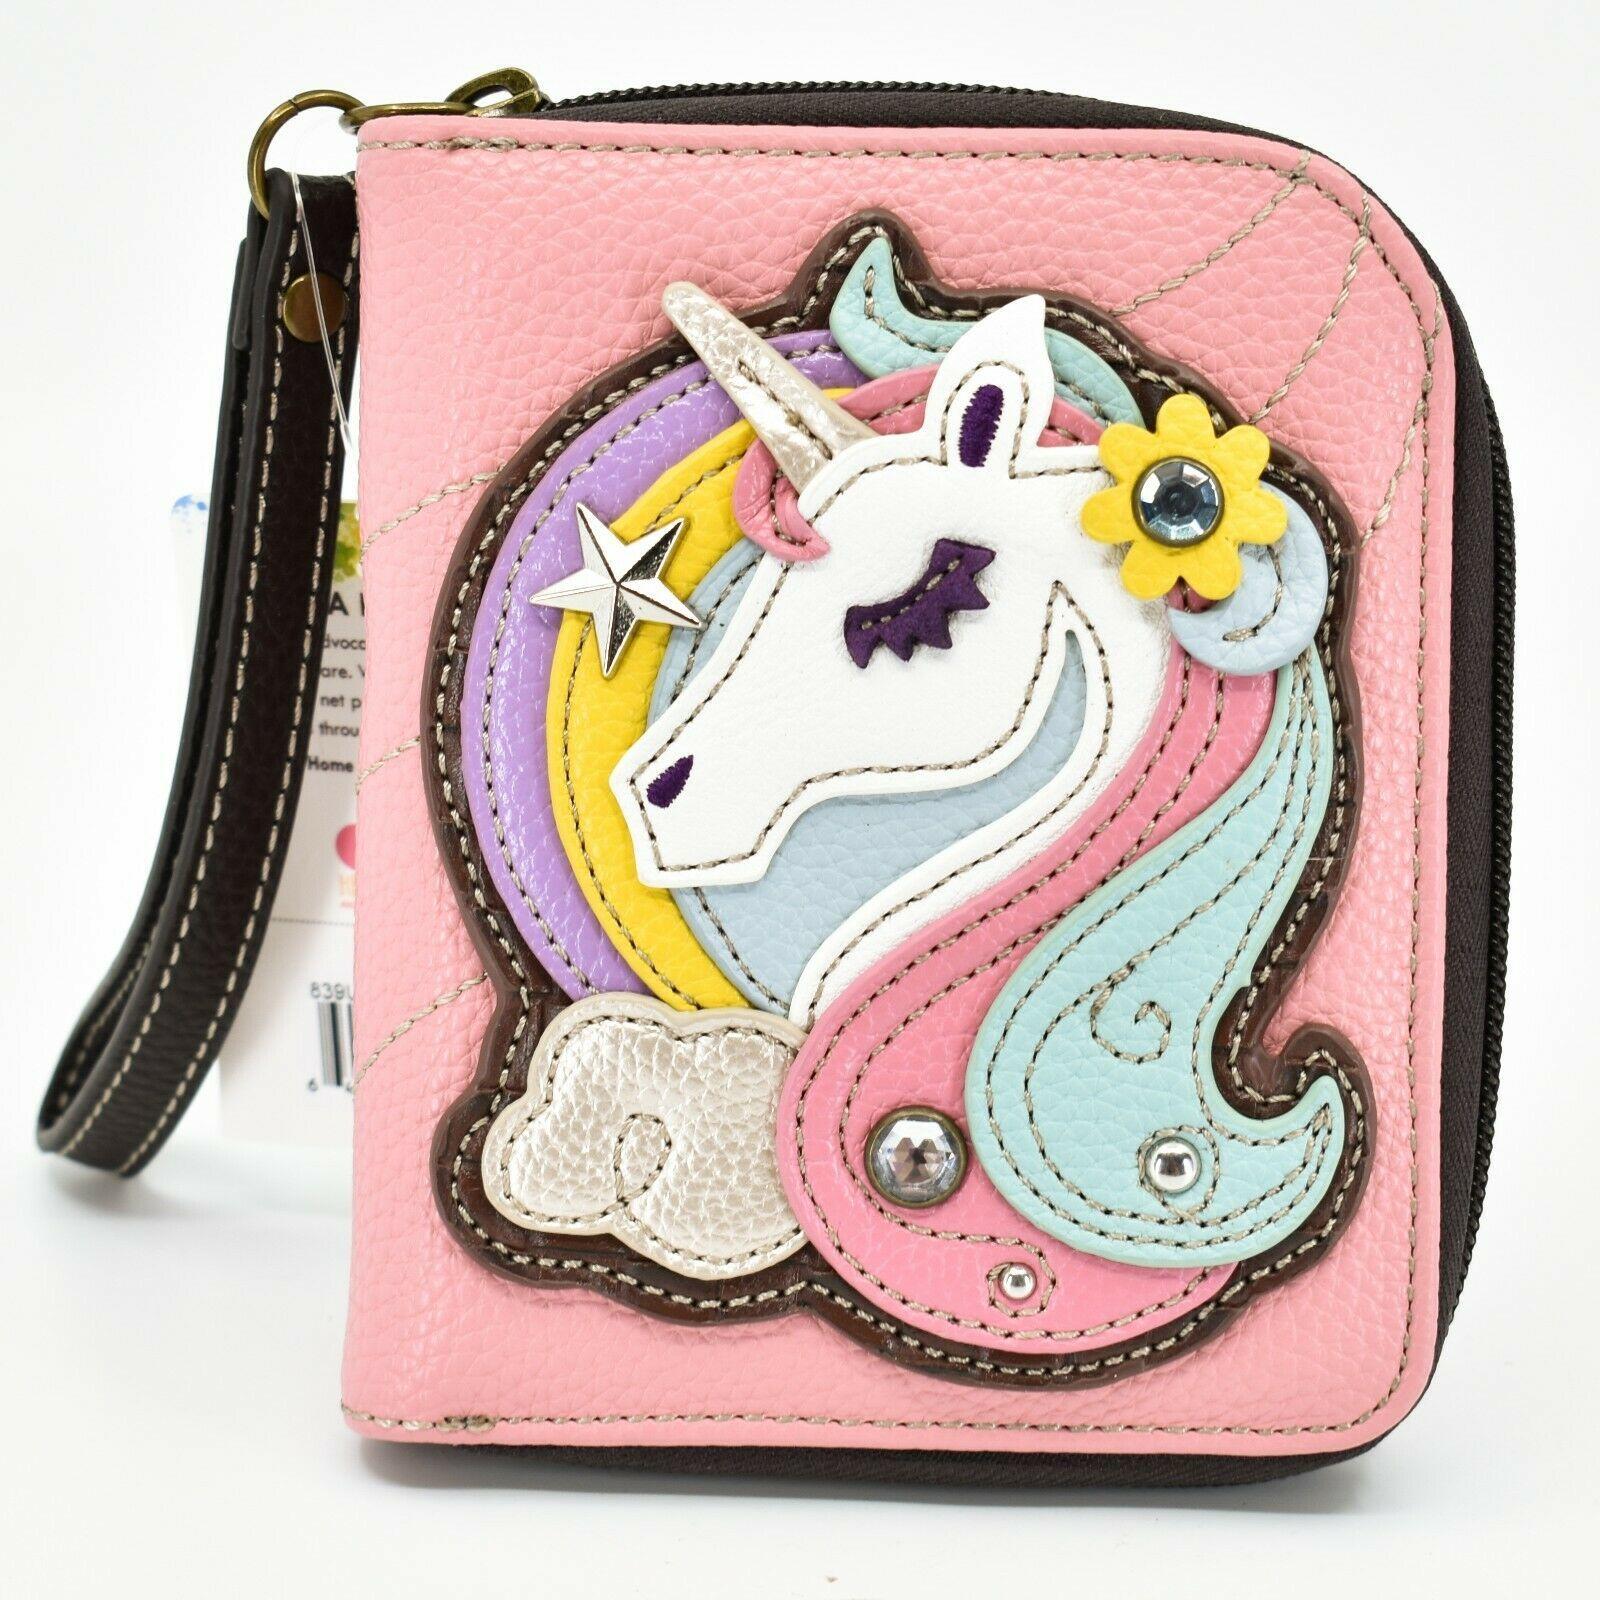 Chala Handbags Faux Leather Whimsical Unicorn Pink Zip Around Wristlet Wallet